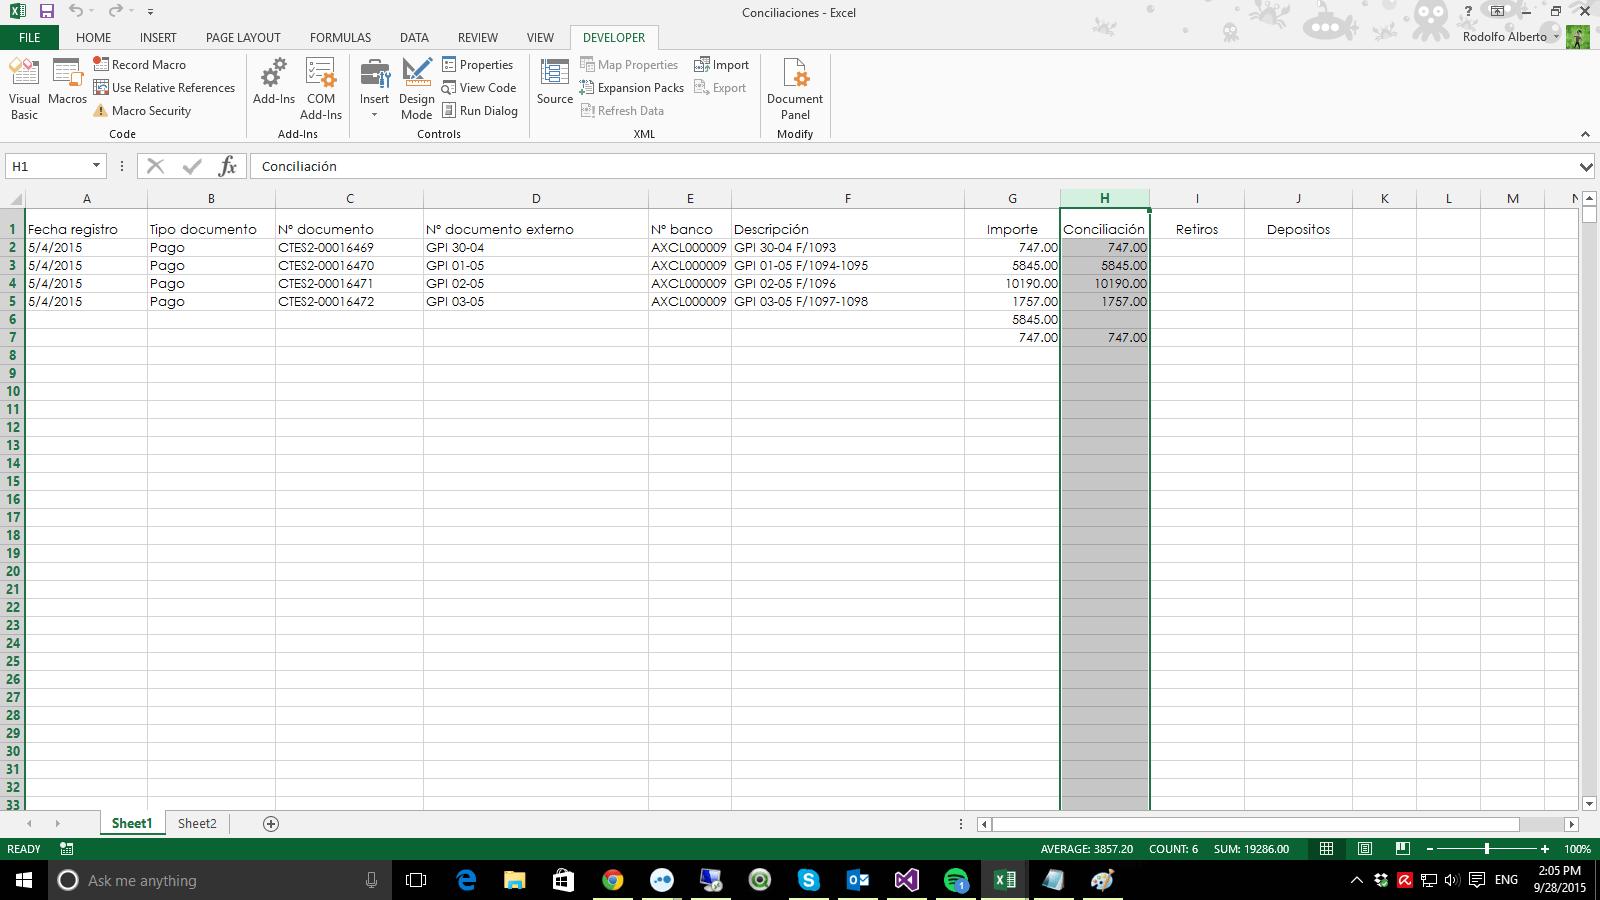 Worksheet Range Clearcontents